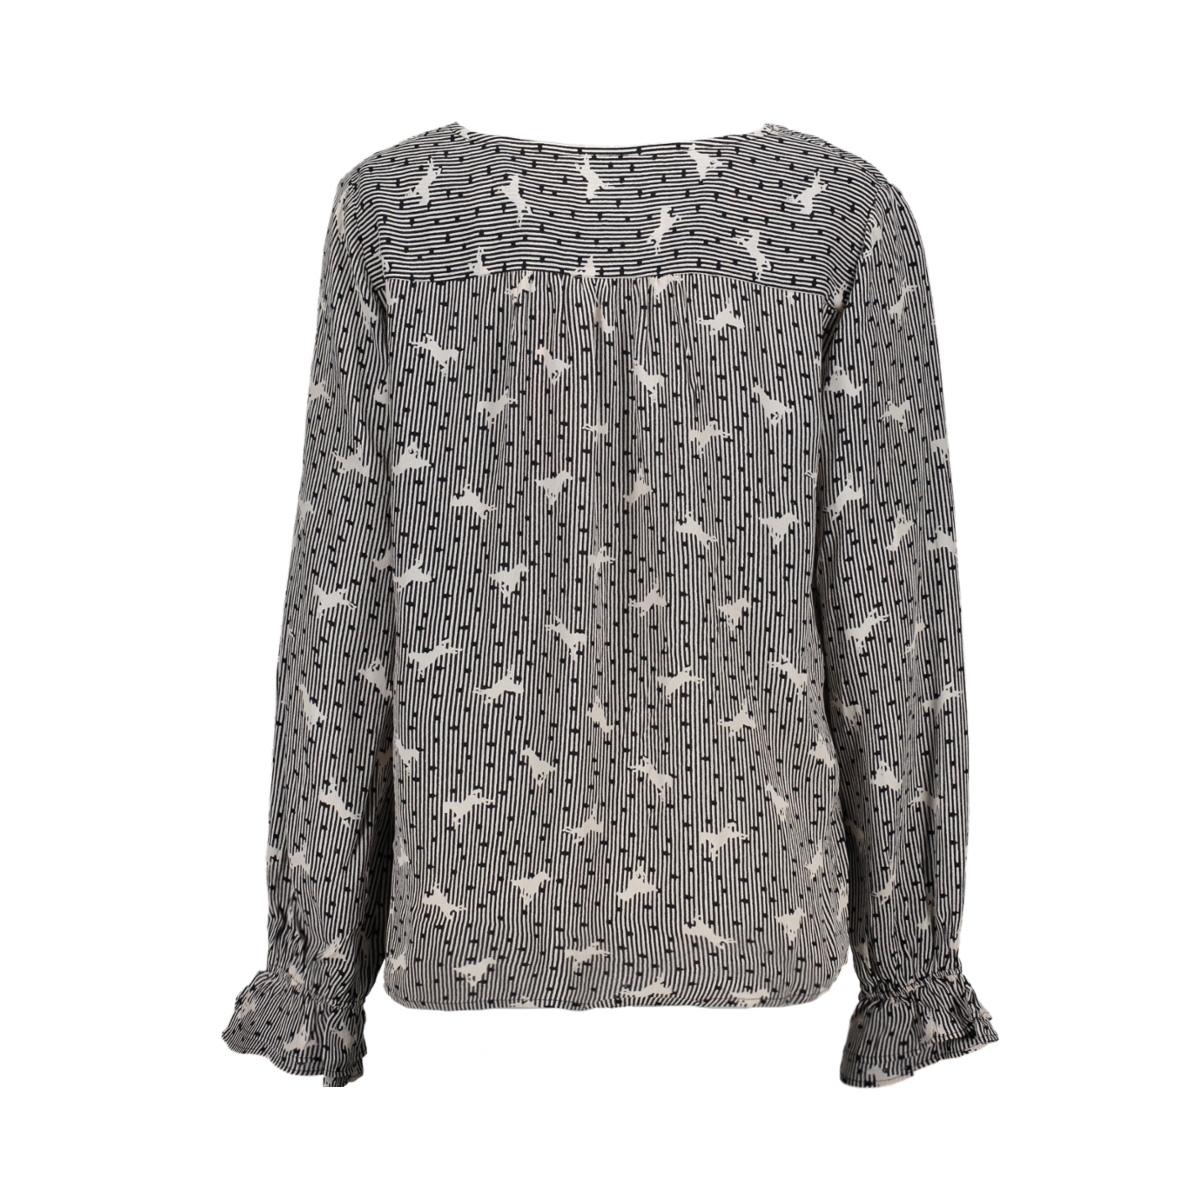 woven shirt l/s u1075 saint tropez blouse 0001 black